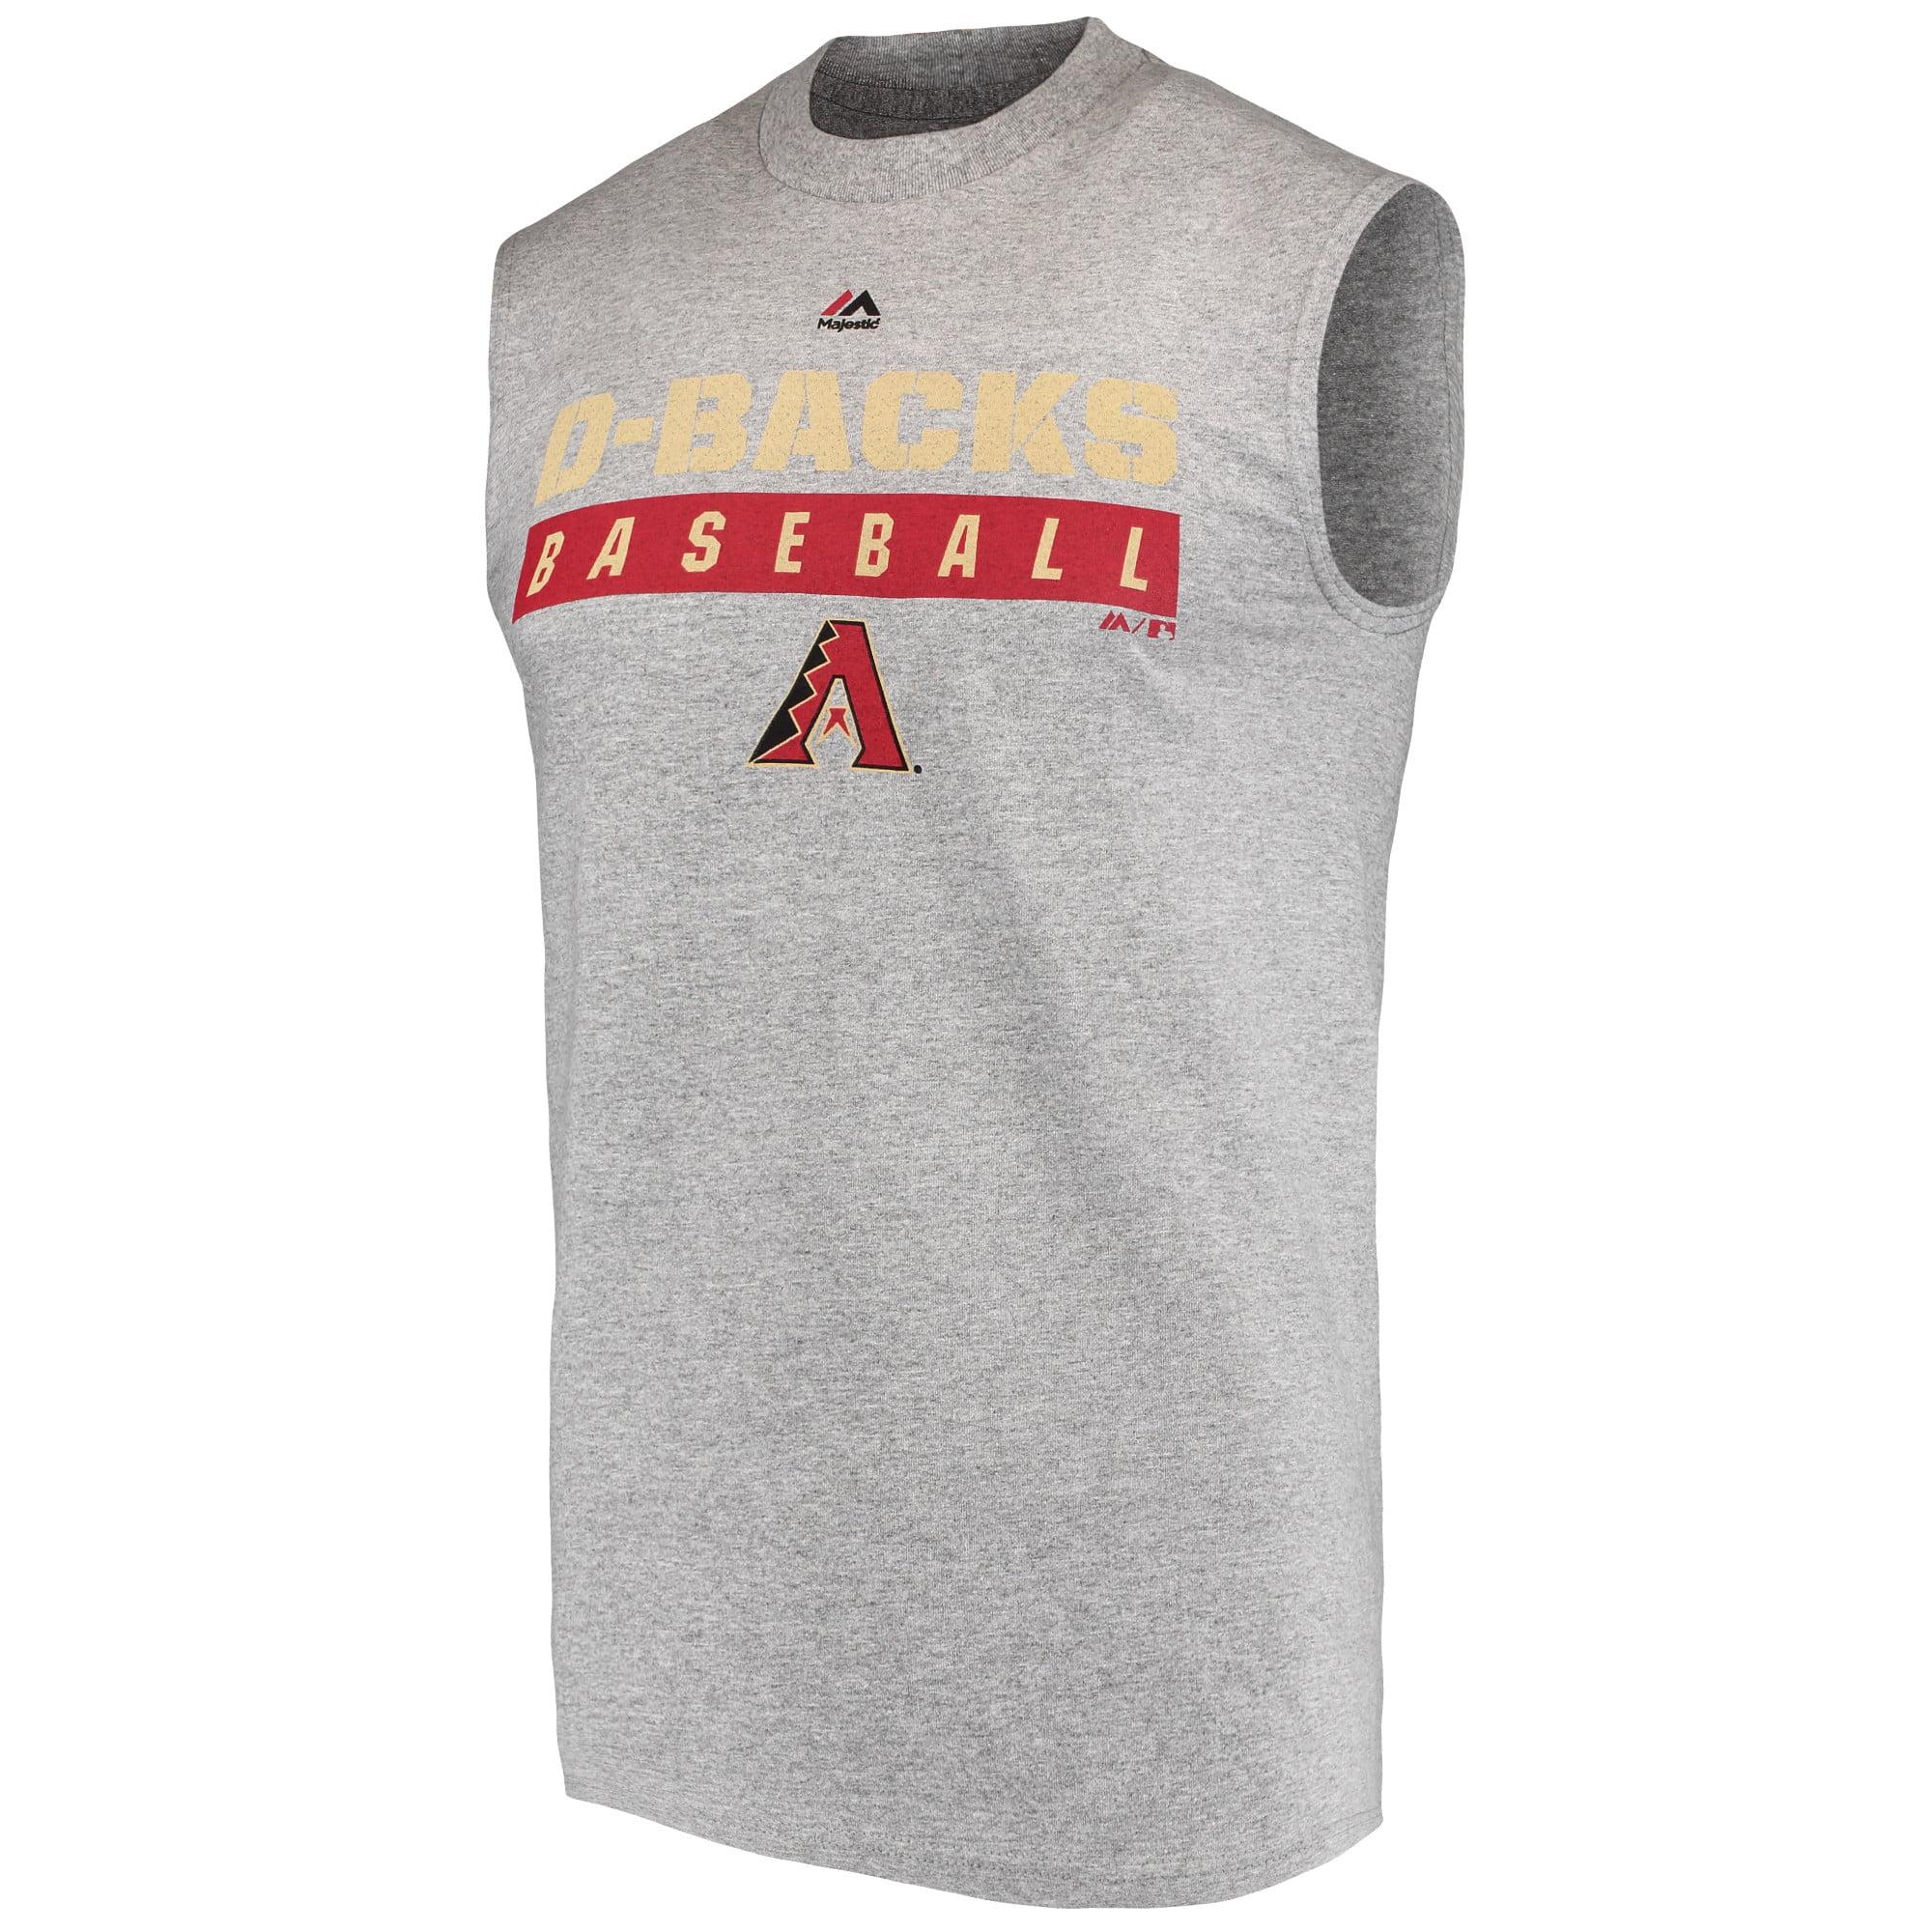 Men's Majestic Gray Arizona Diamondbacks Proven Pastime Sleeveless T-Shirt